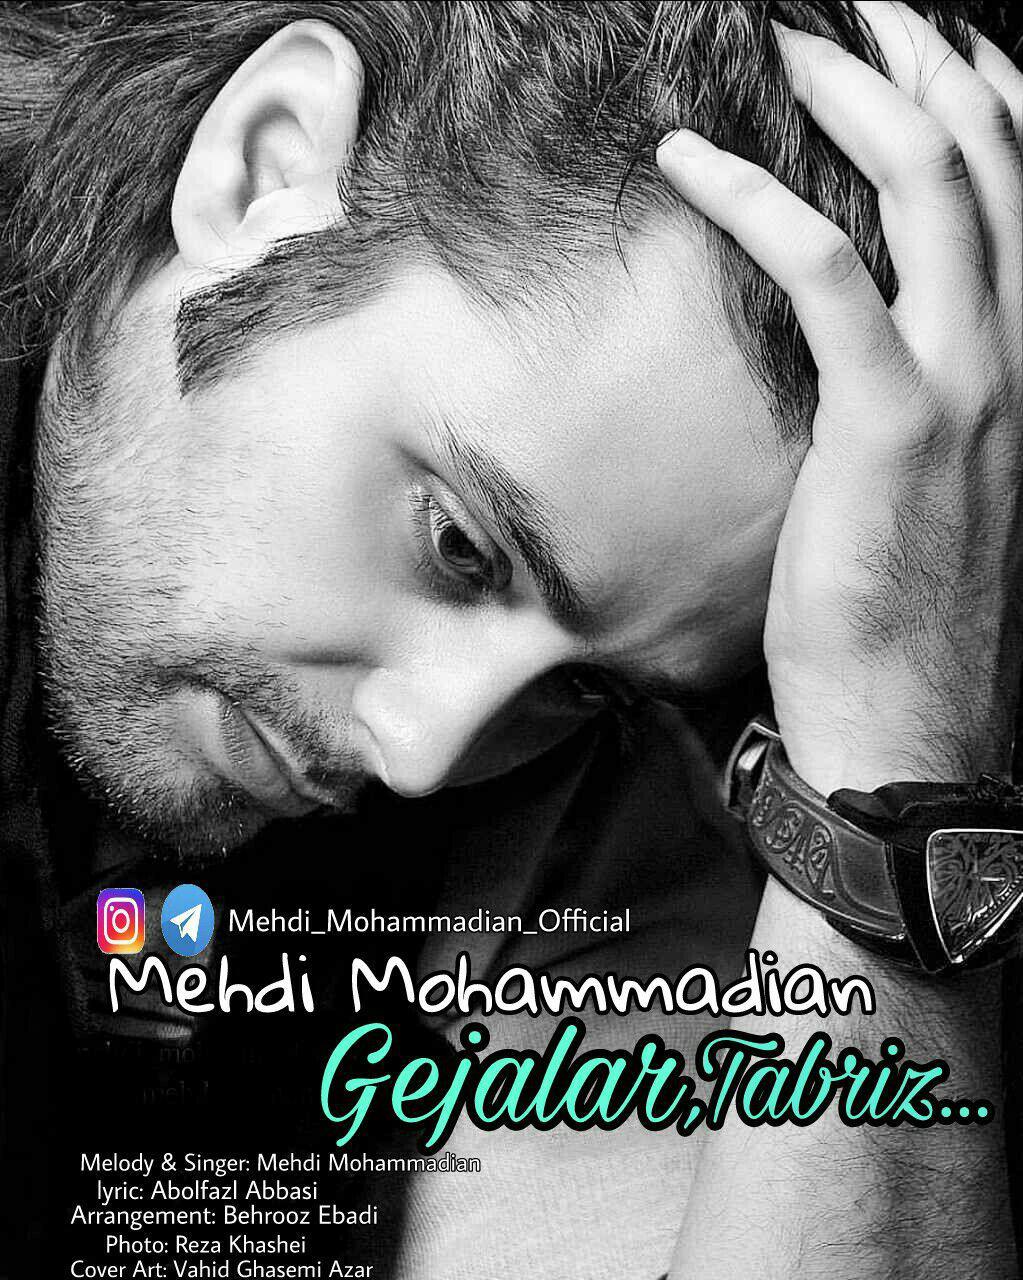 http://s9.picofile.com/file/8329982100/28Mehdi_Mohammadian_%E2%80%93_Gejalar_Tabriz.jpg